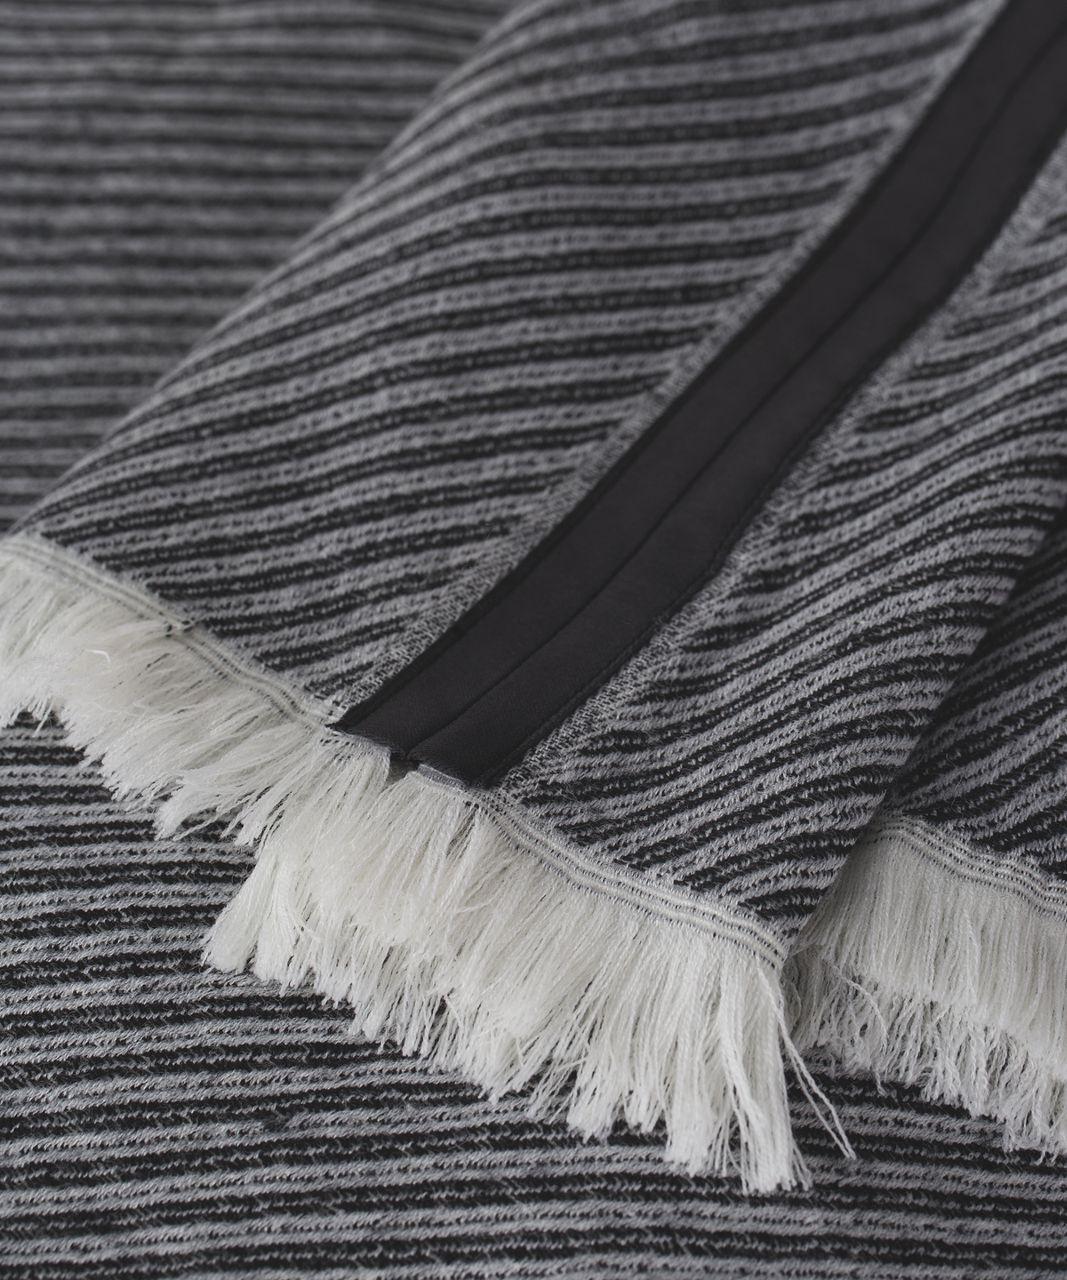 Lululemon Sit In Silence Scarf - Telemark Print White Black / White